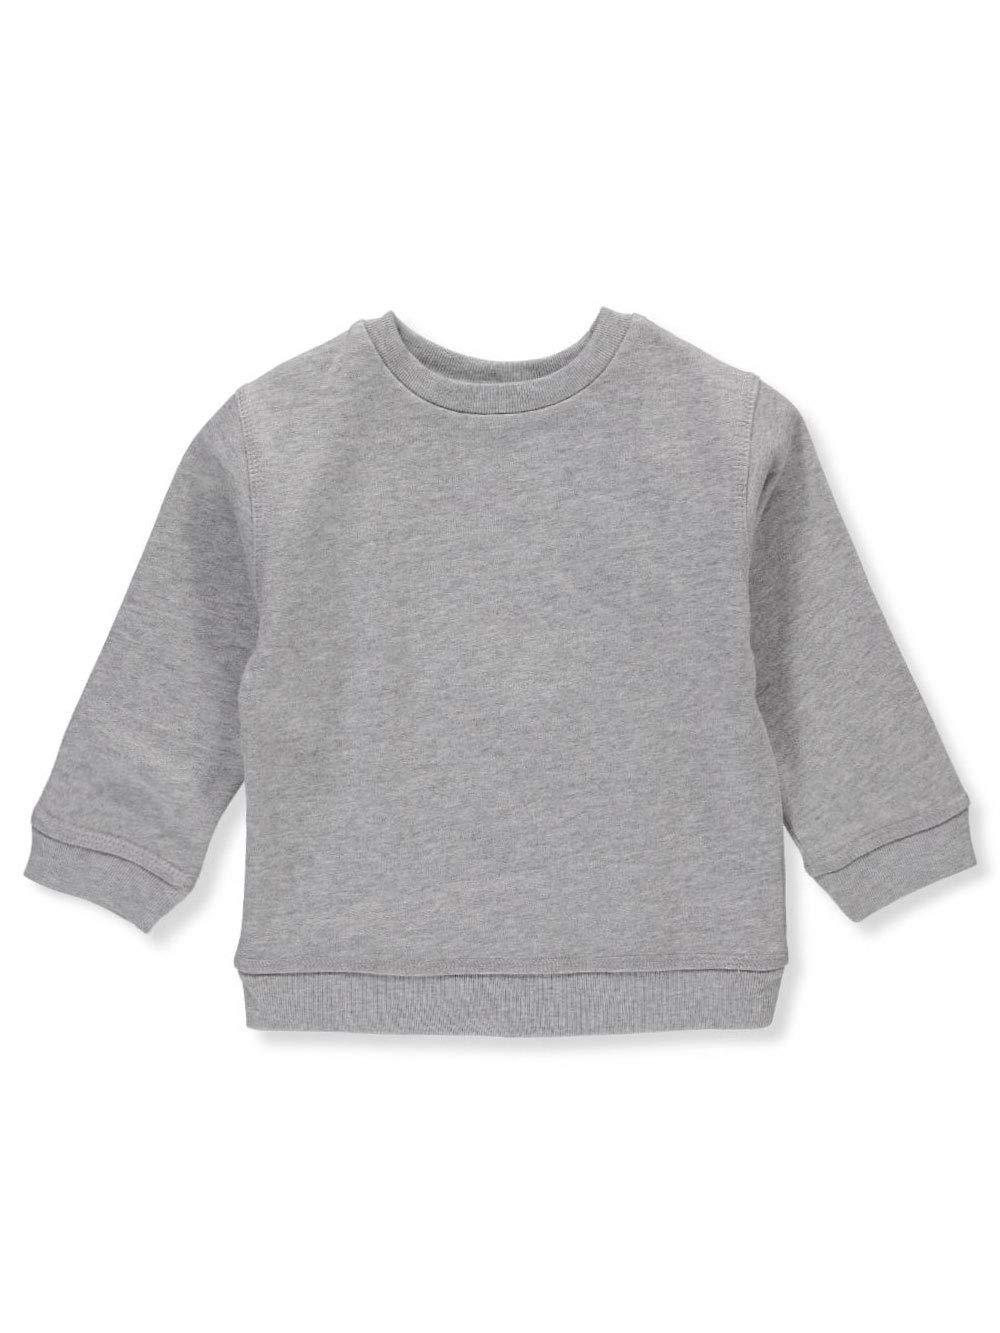 Miniwear Baby Boys' Sweatshirt - heather gray, 3-6 months